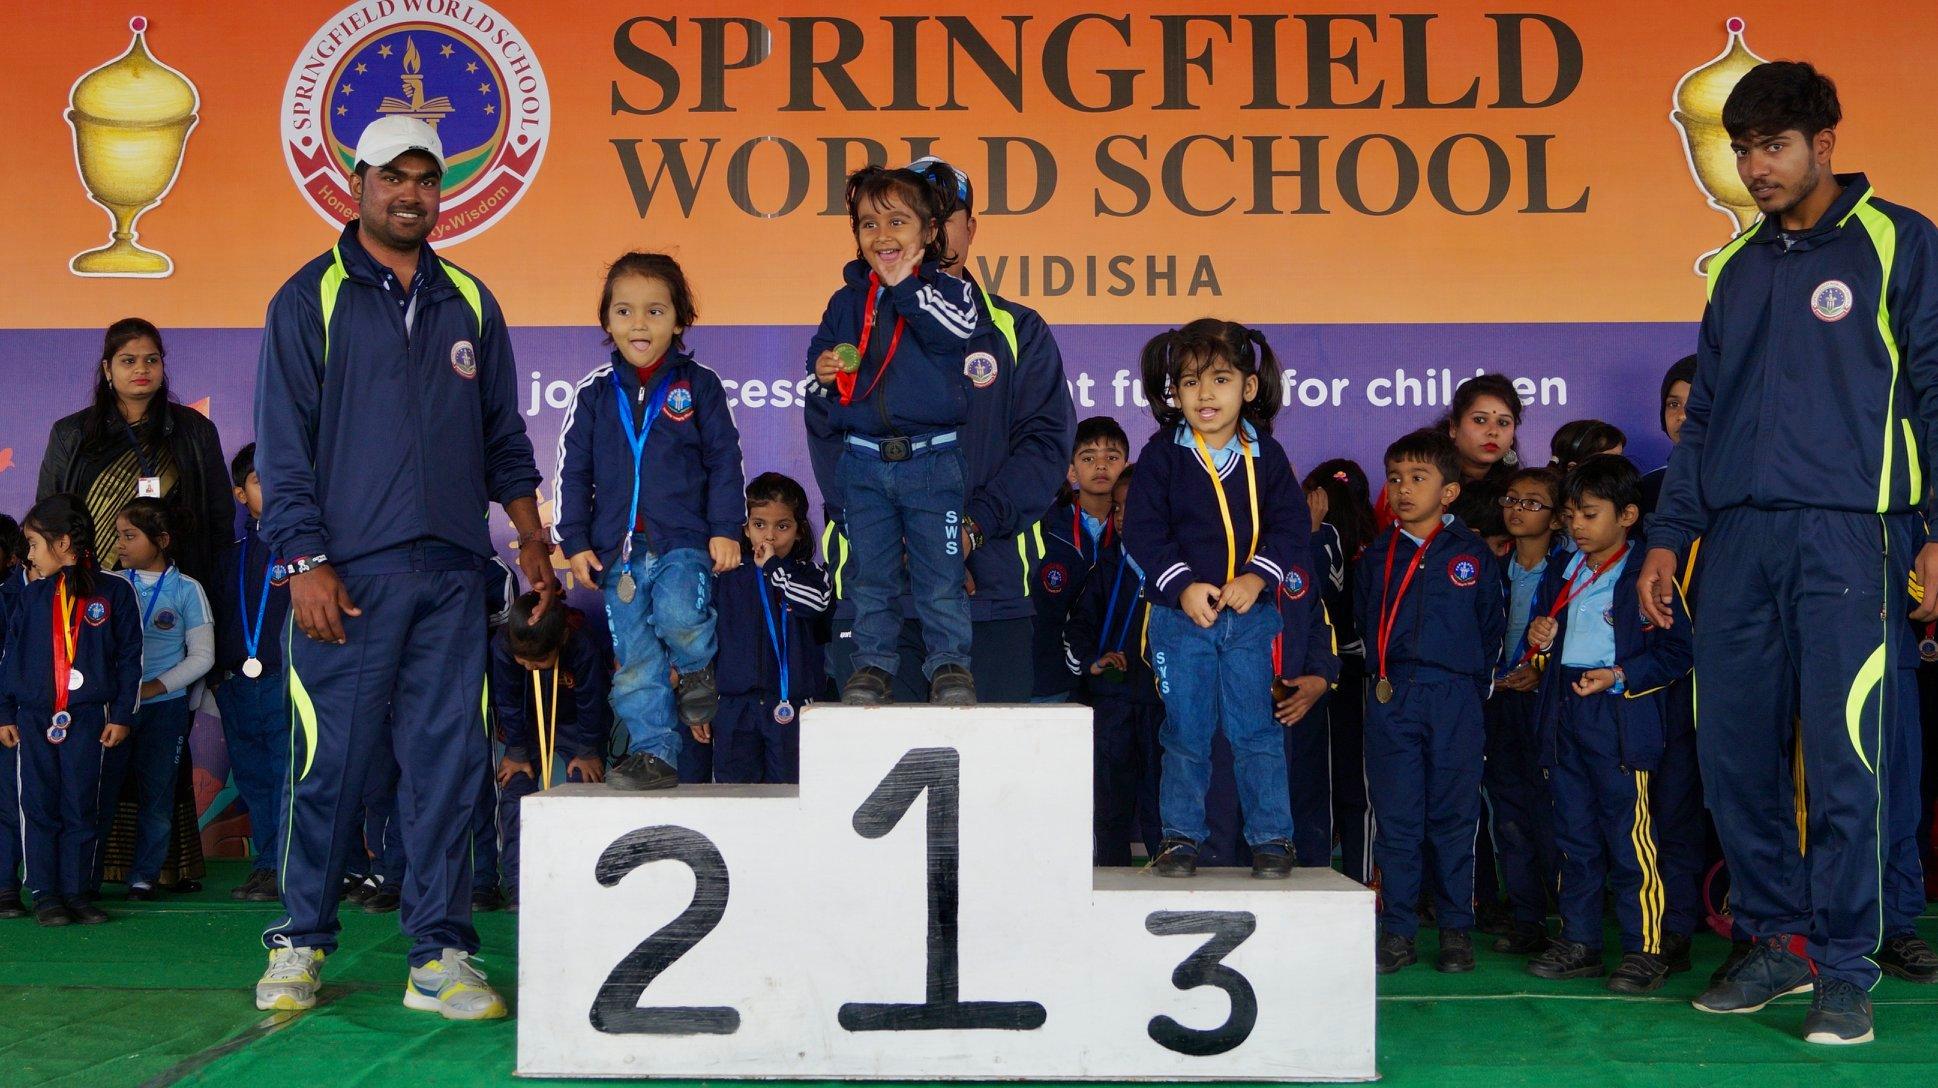 Springfield World School - News & Media